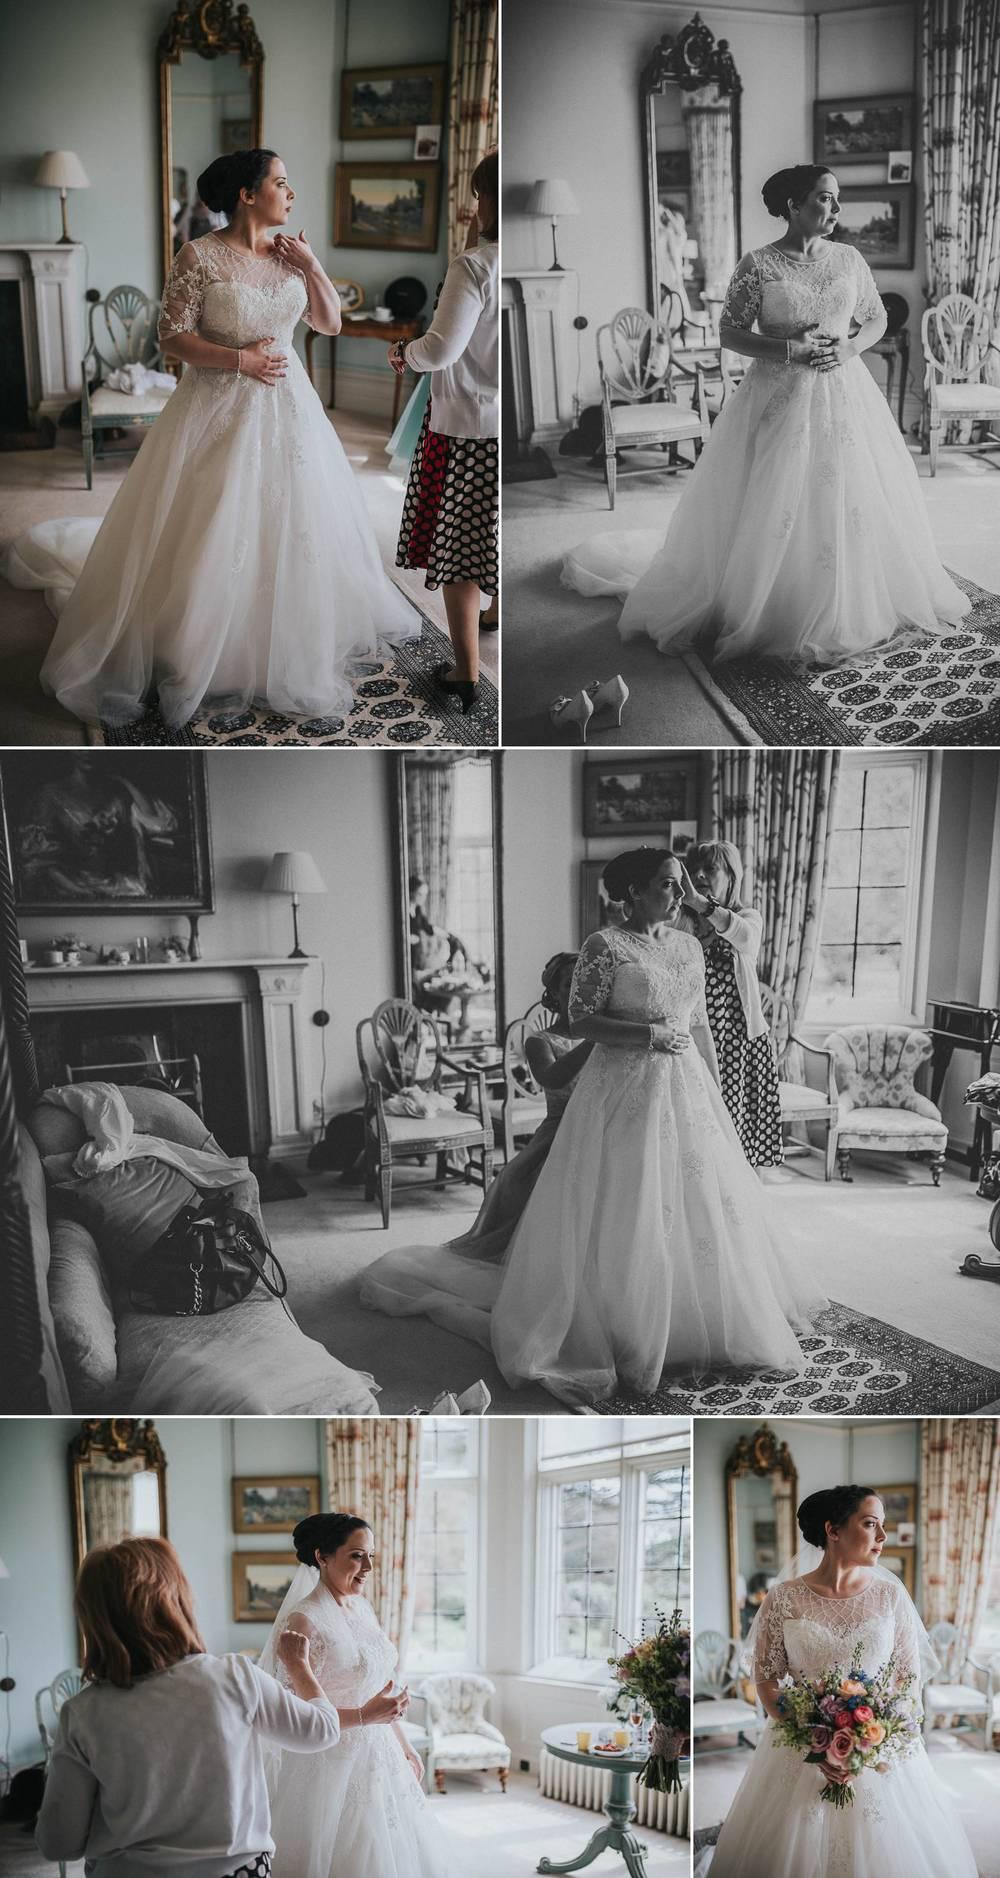 wedding-photographer-staffordshire 7.jpg